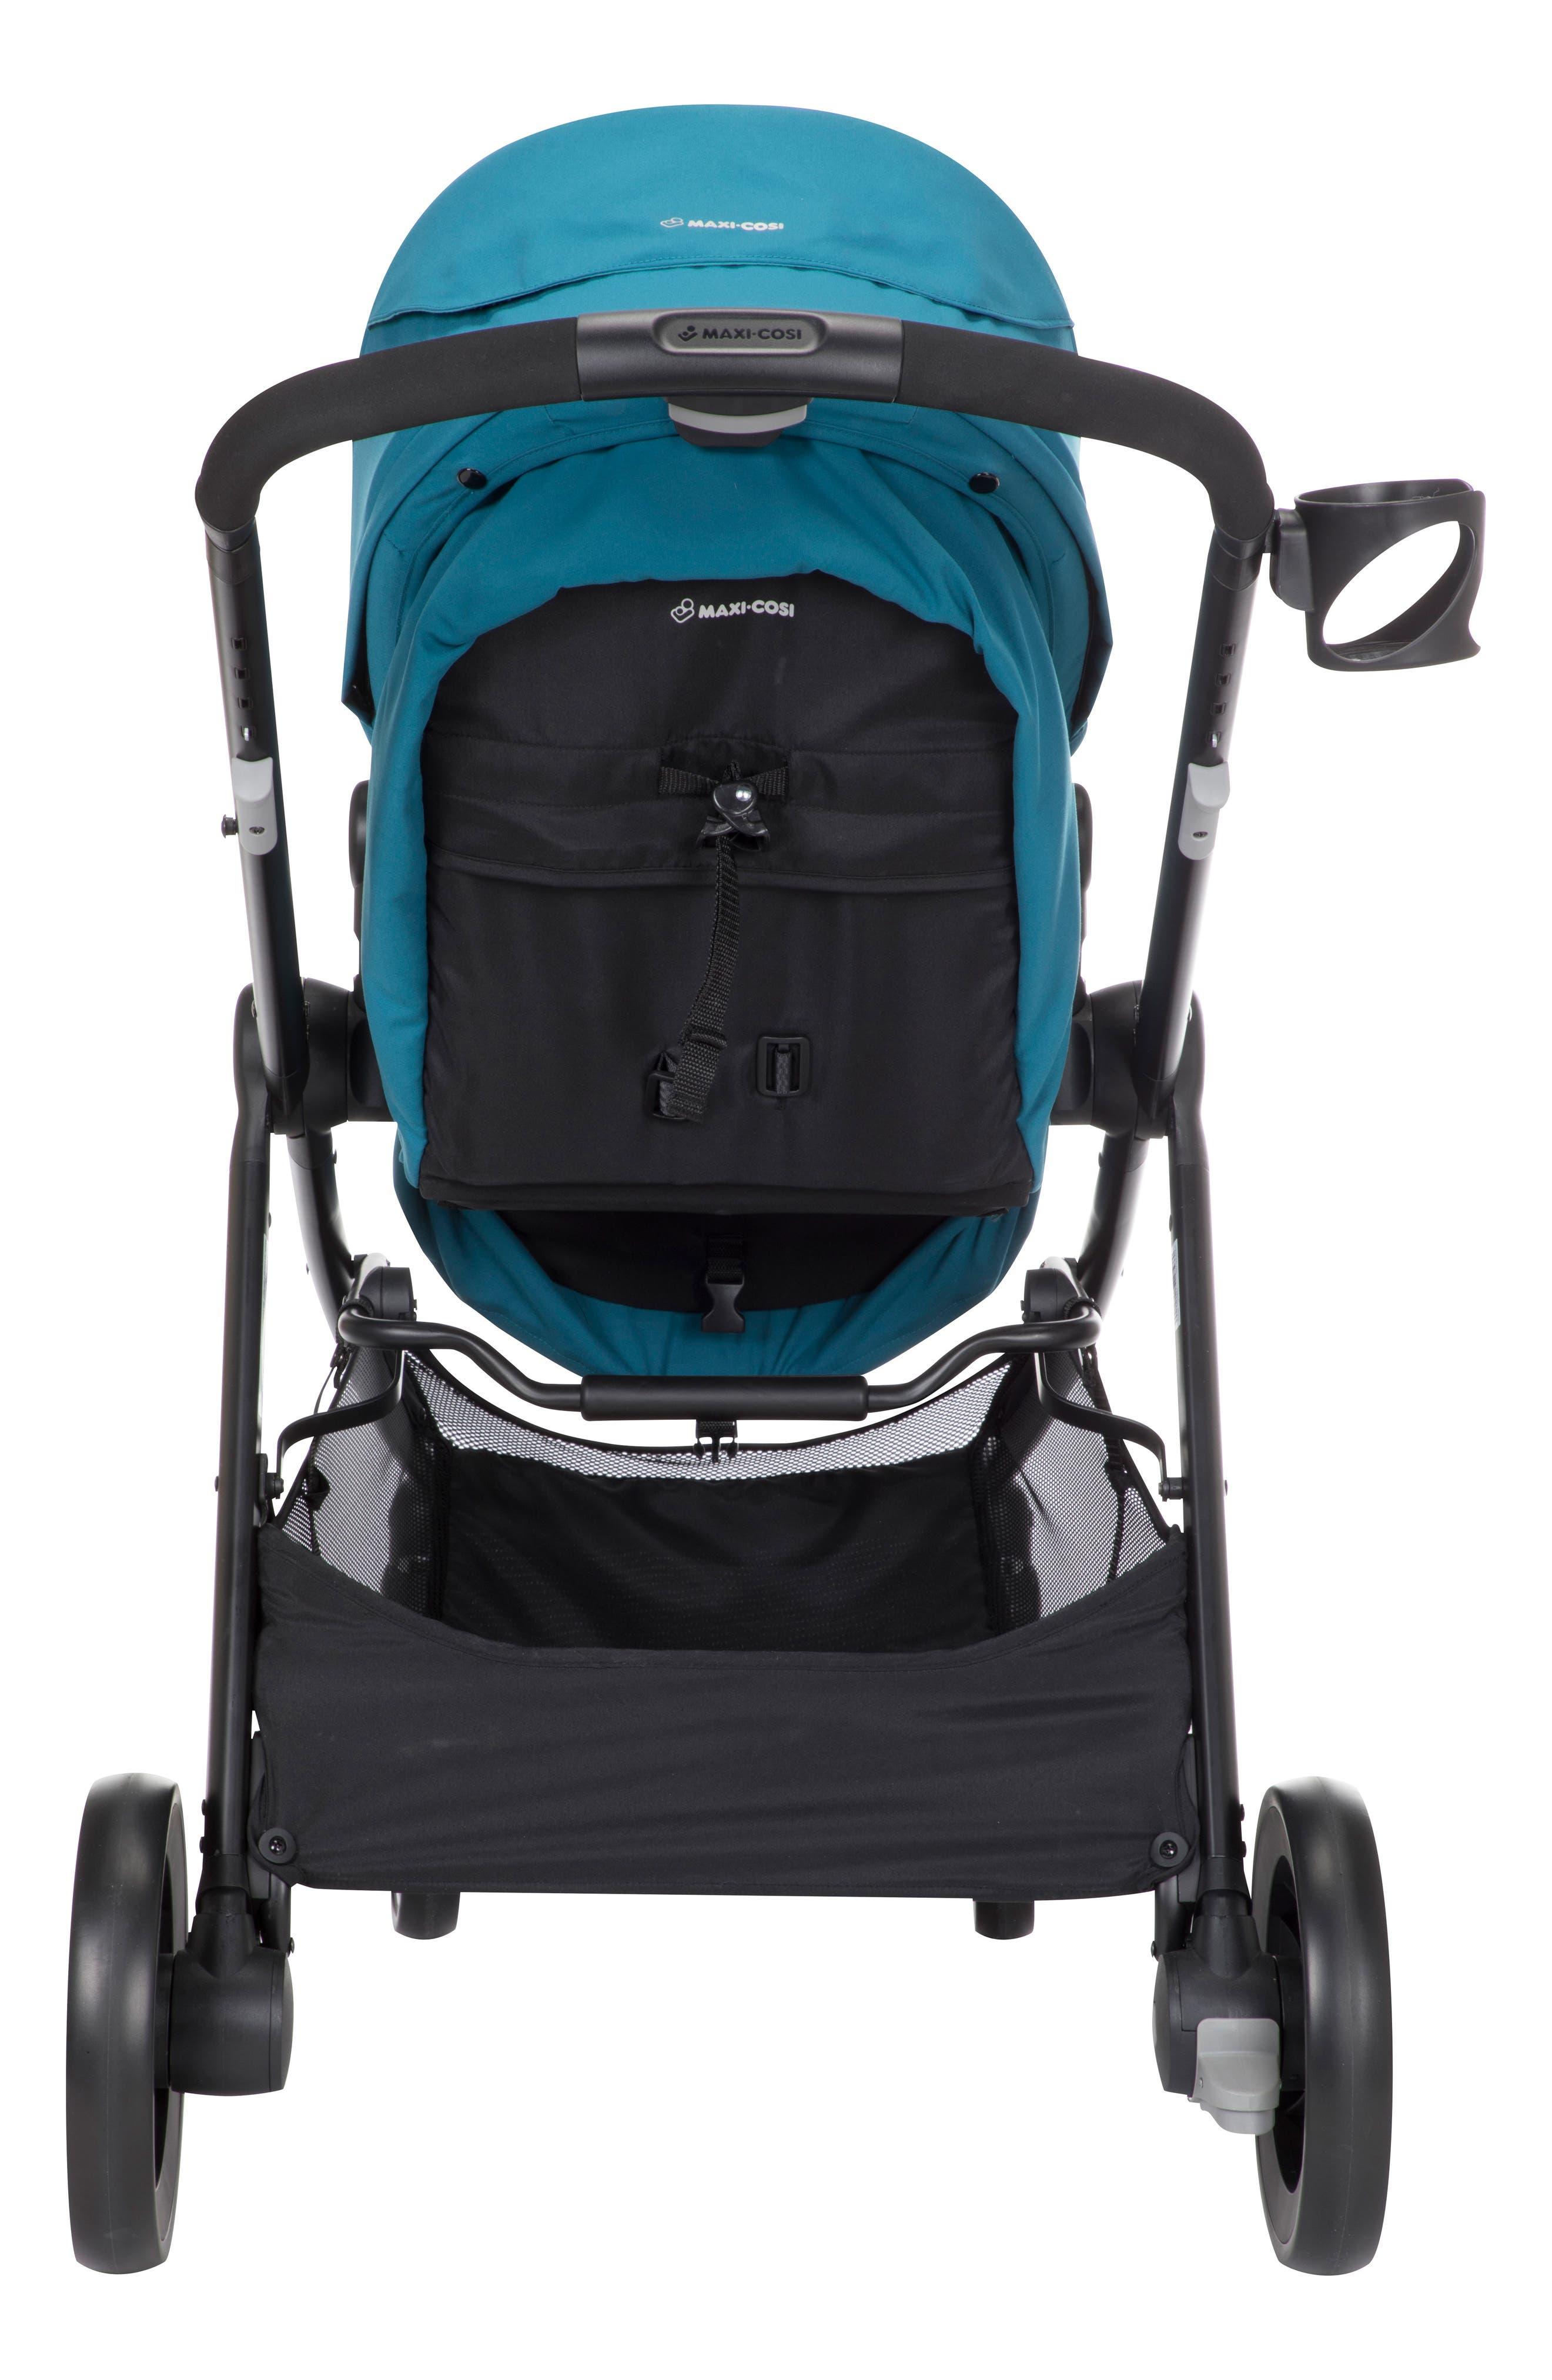 5-1 Mico 30 Infant Car Seat & Zelia Stroller Modular Travel System,                             Alternate thumbnail 3, color,                             EMERALD TIDE